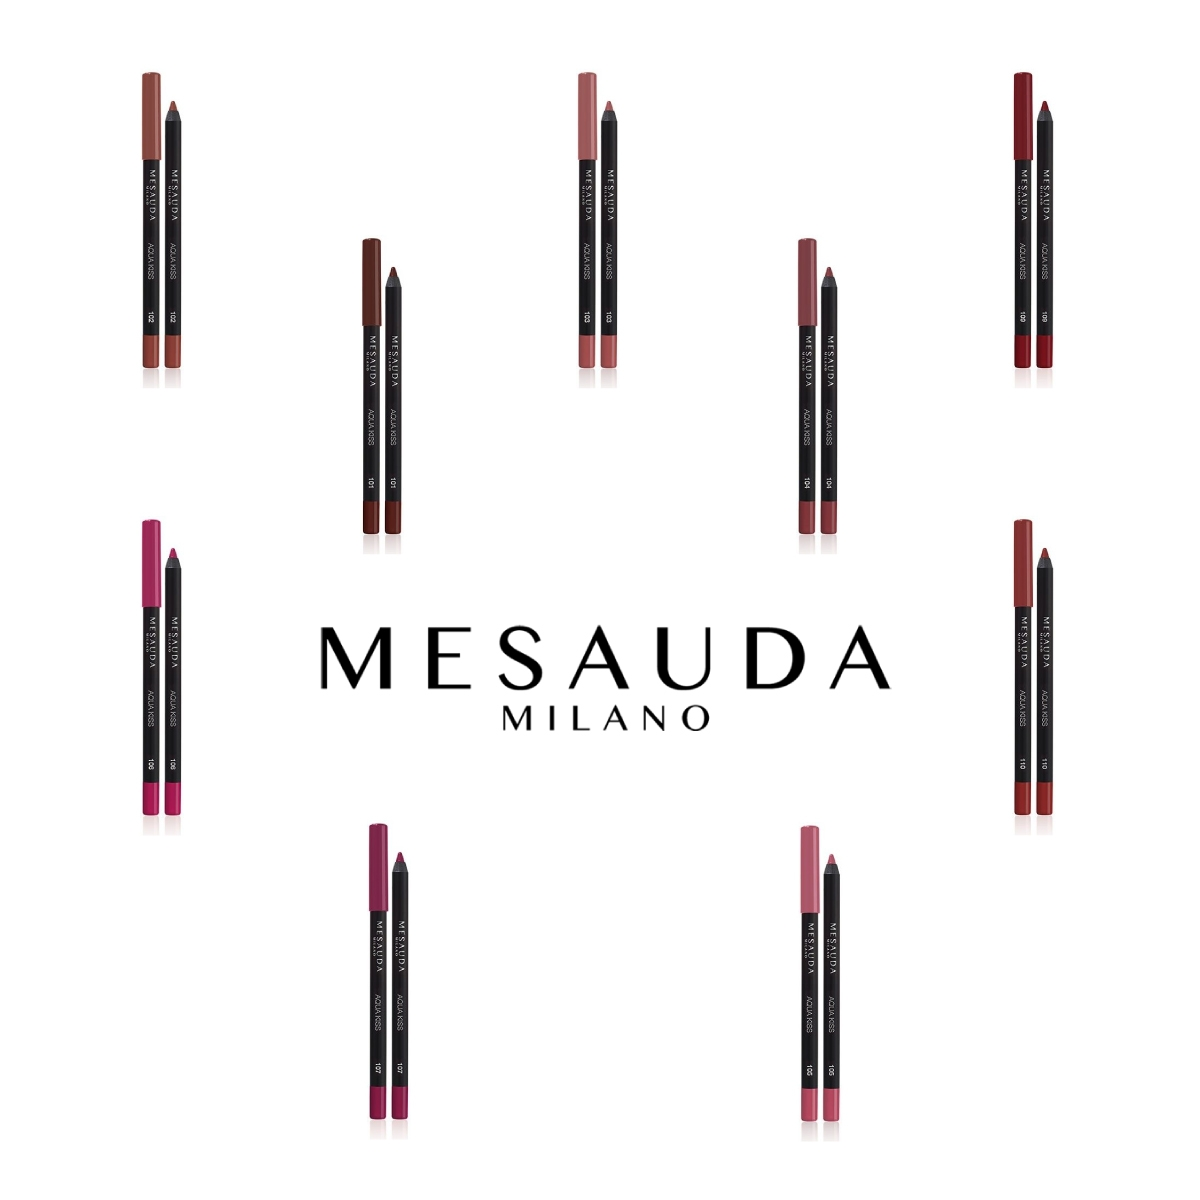 mesauda-aqua-kiss-thebeautybrothers